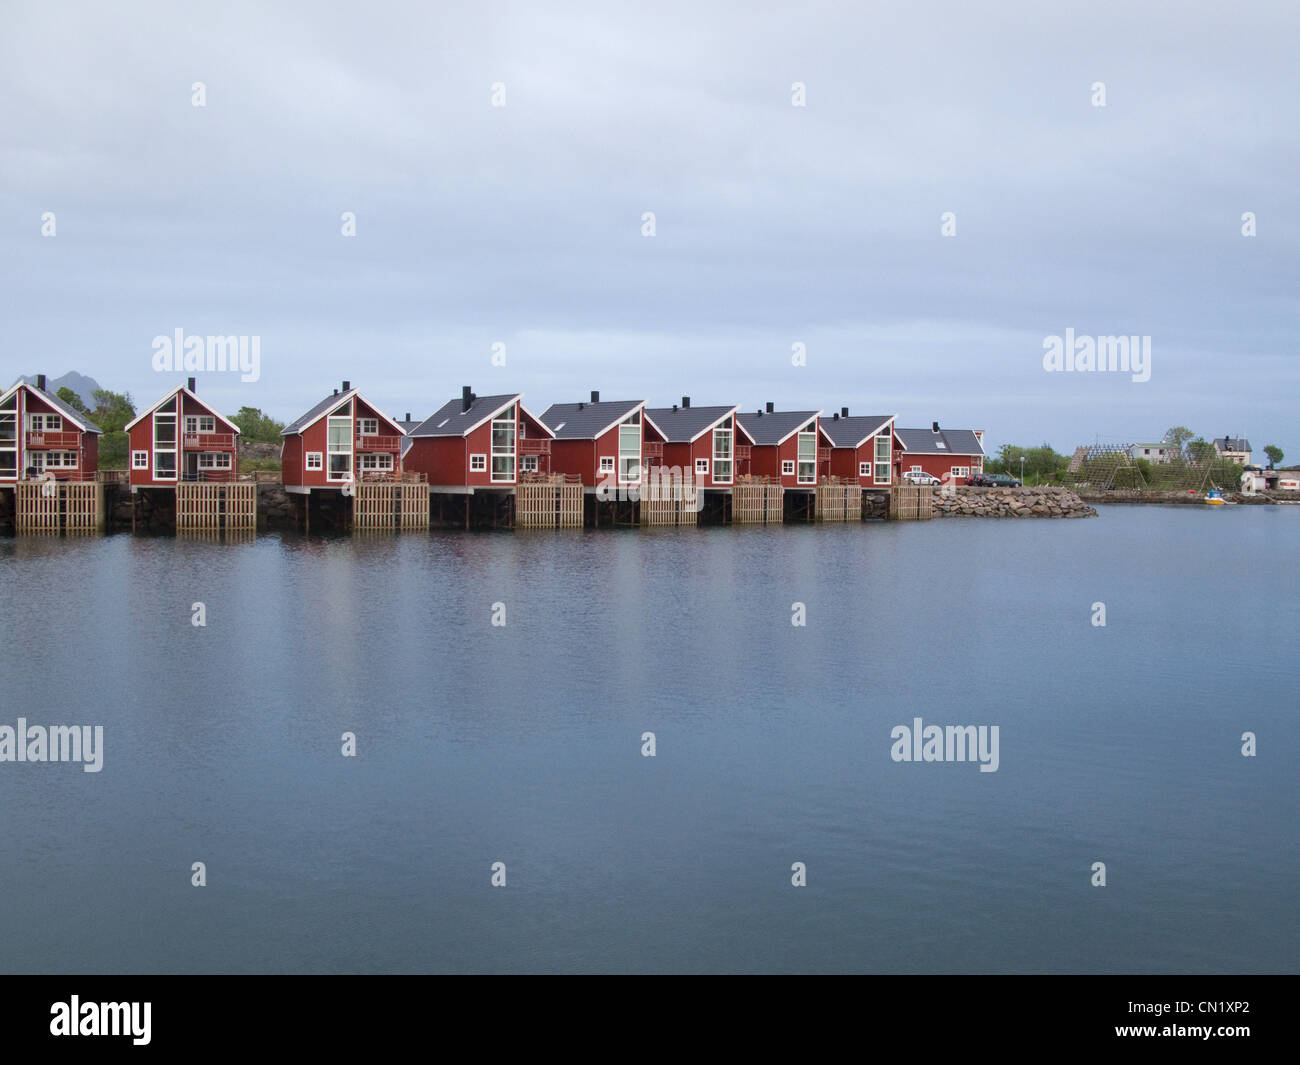 Houses on lake, Lofoten Islands, Norway - Stock Image